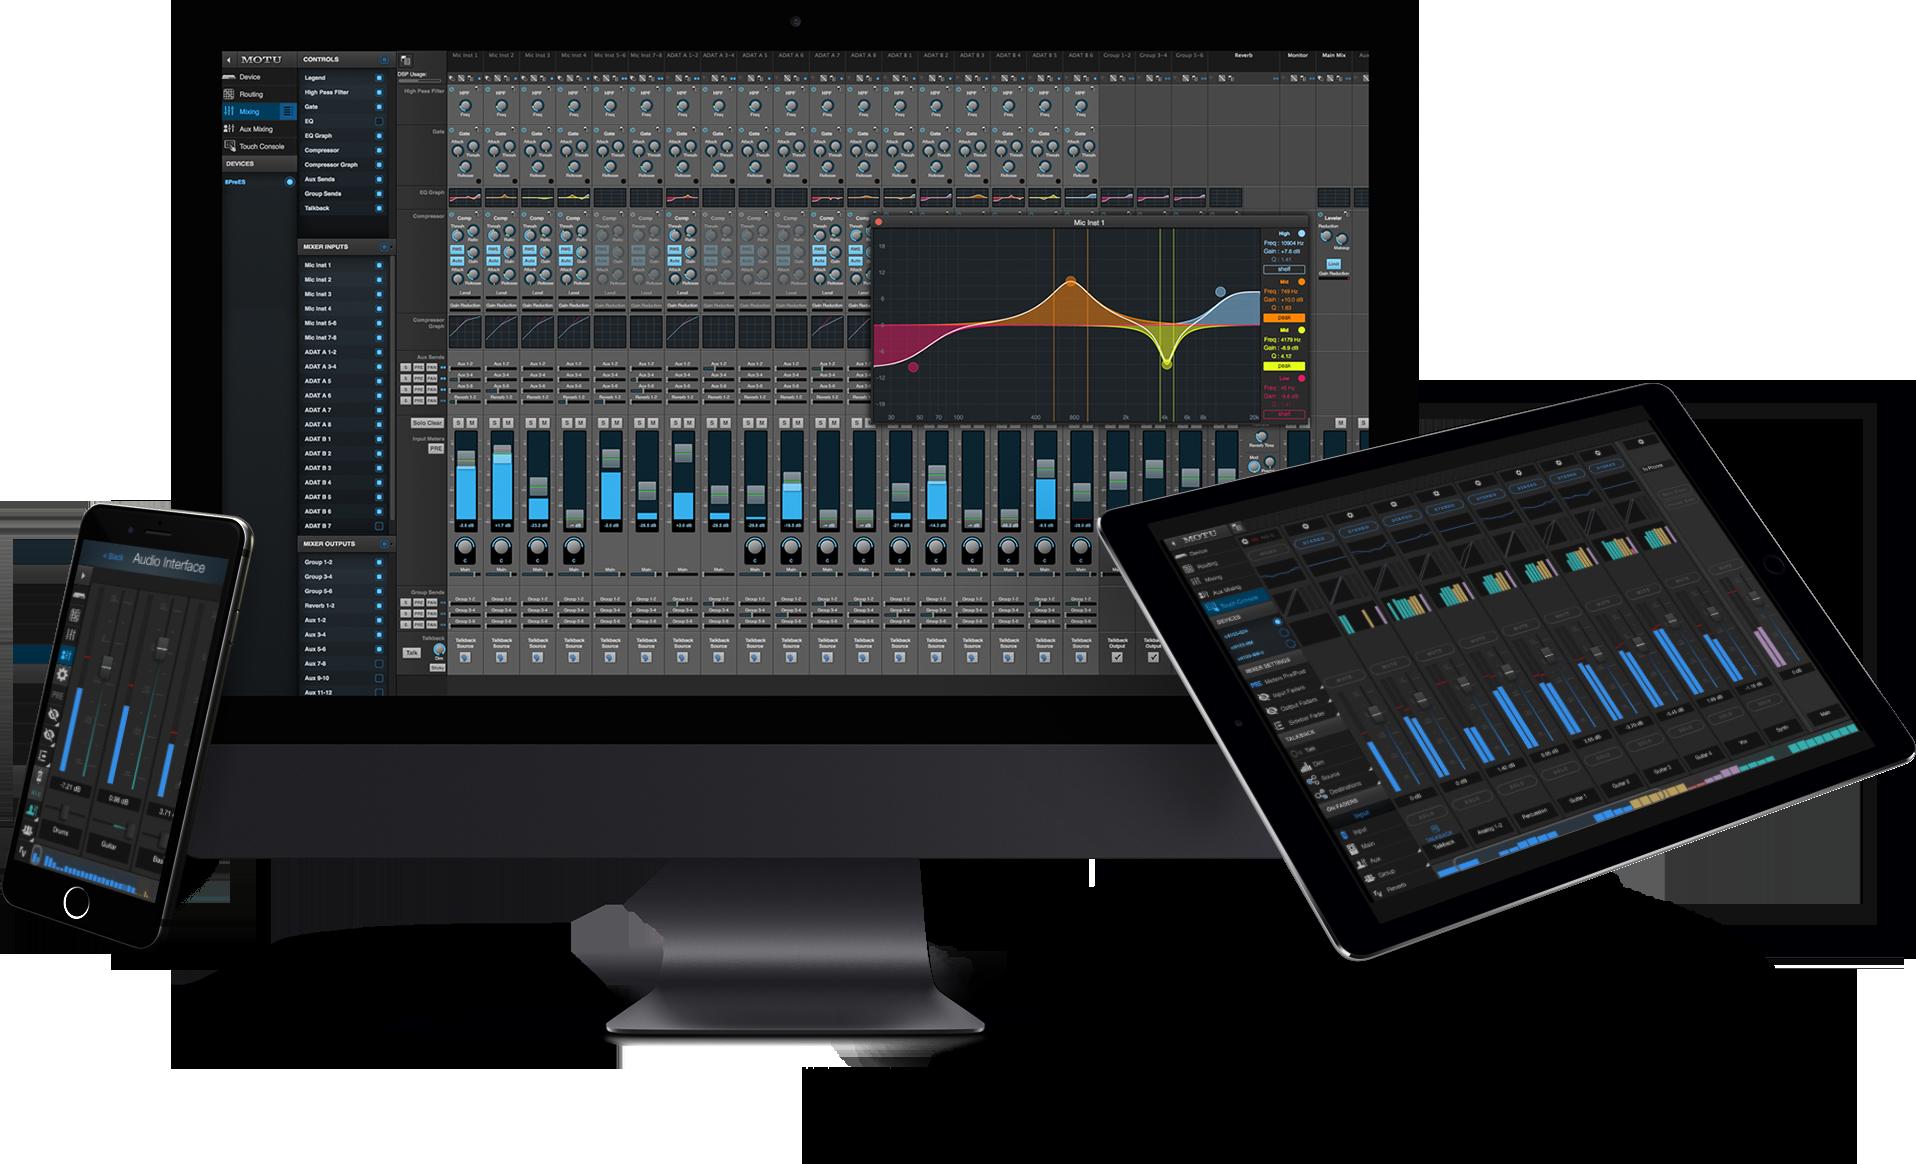 MOTU Pro Audio Mixer